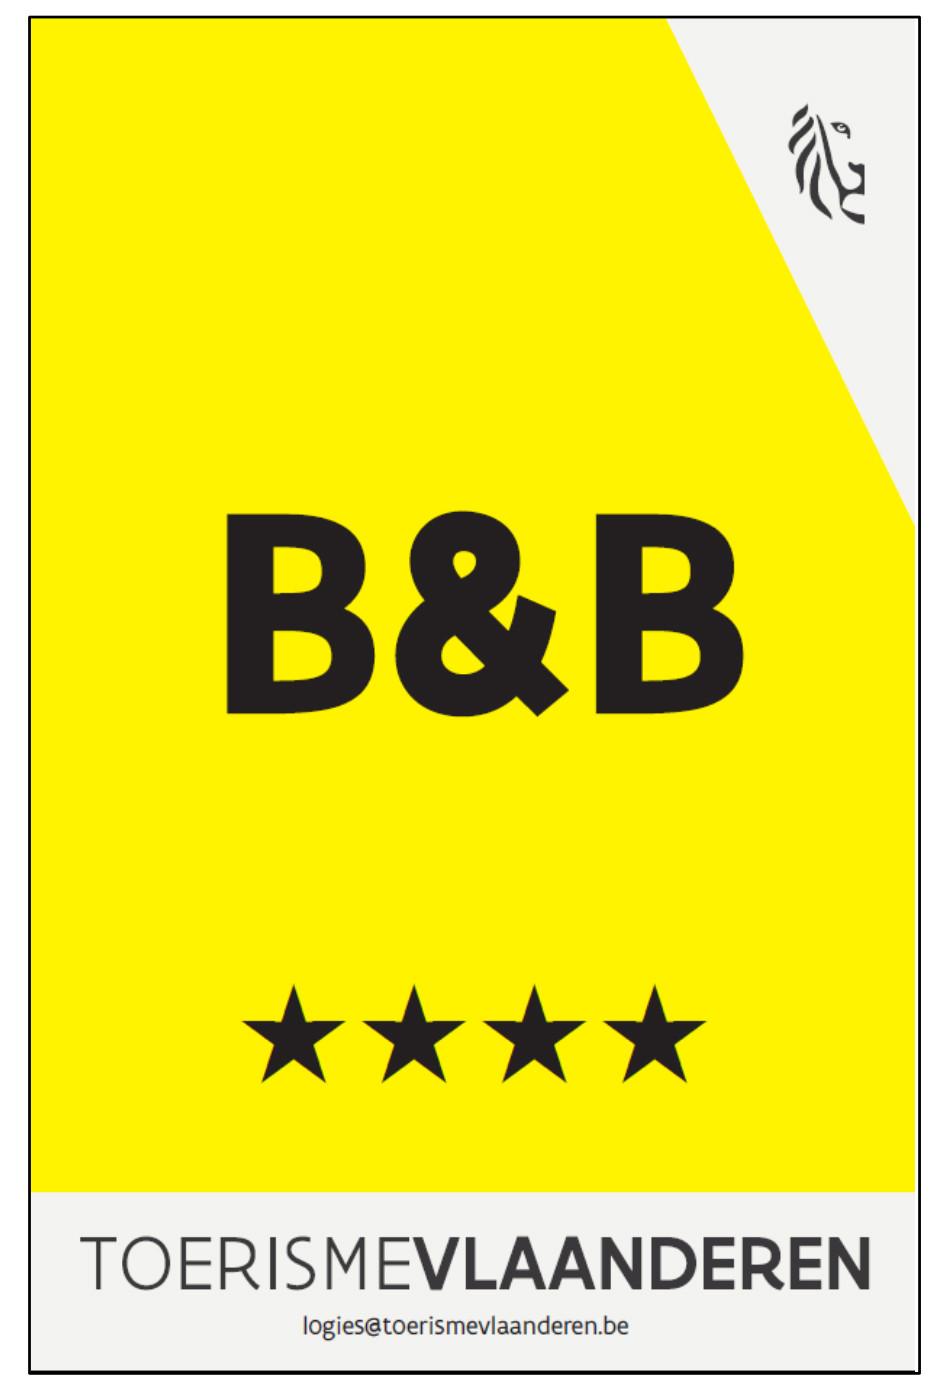 B&B logo 4 sterren Toerisme Vlaanderen